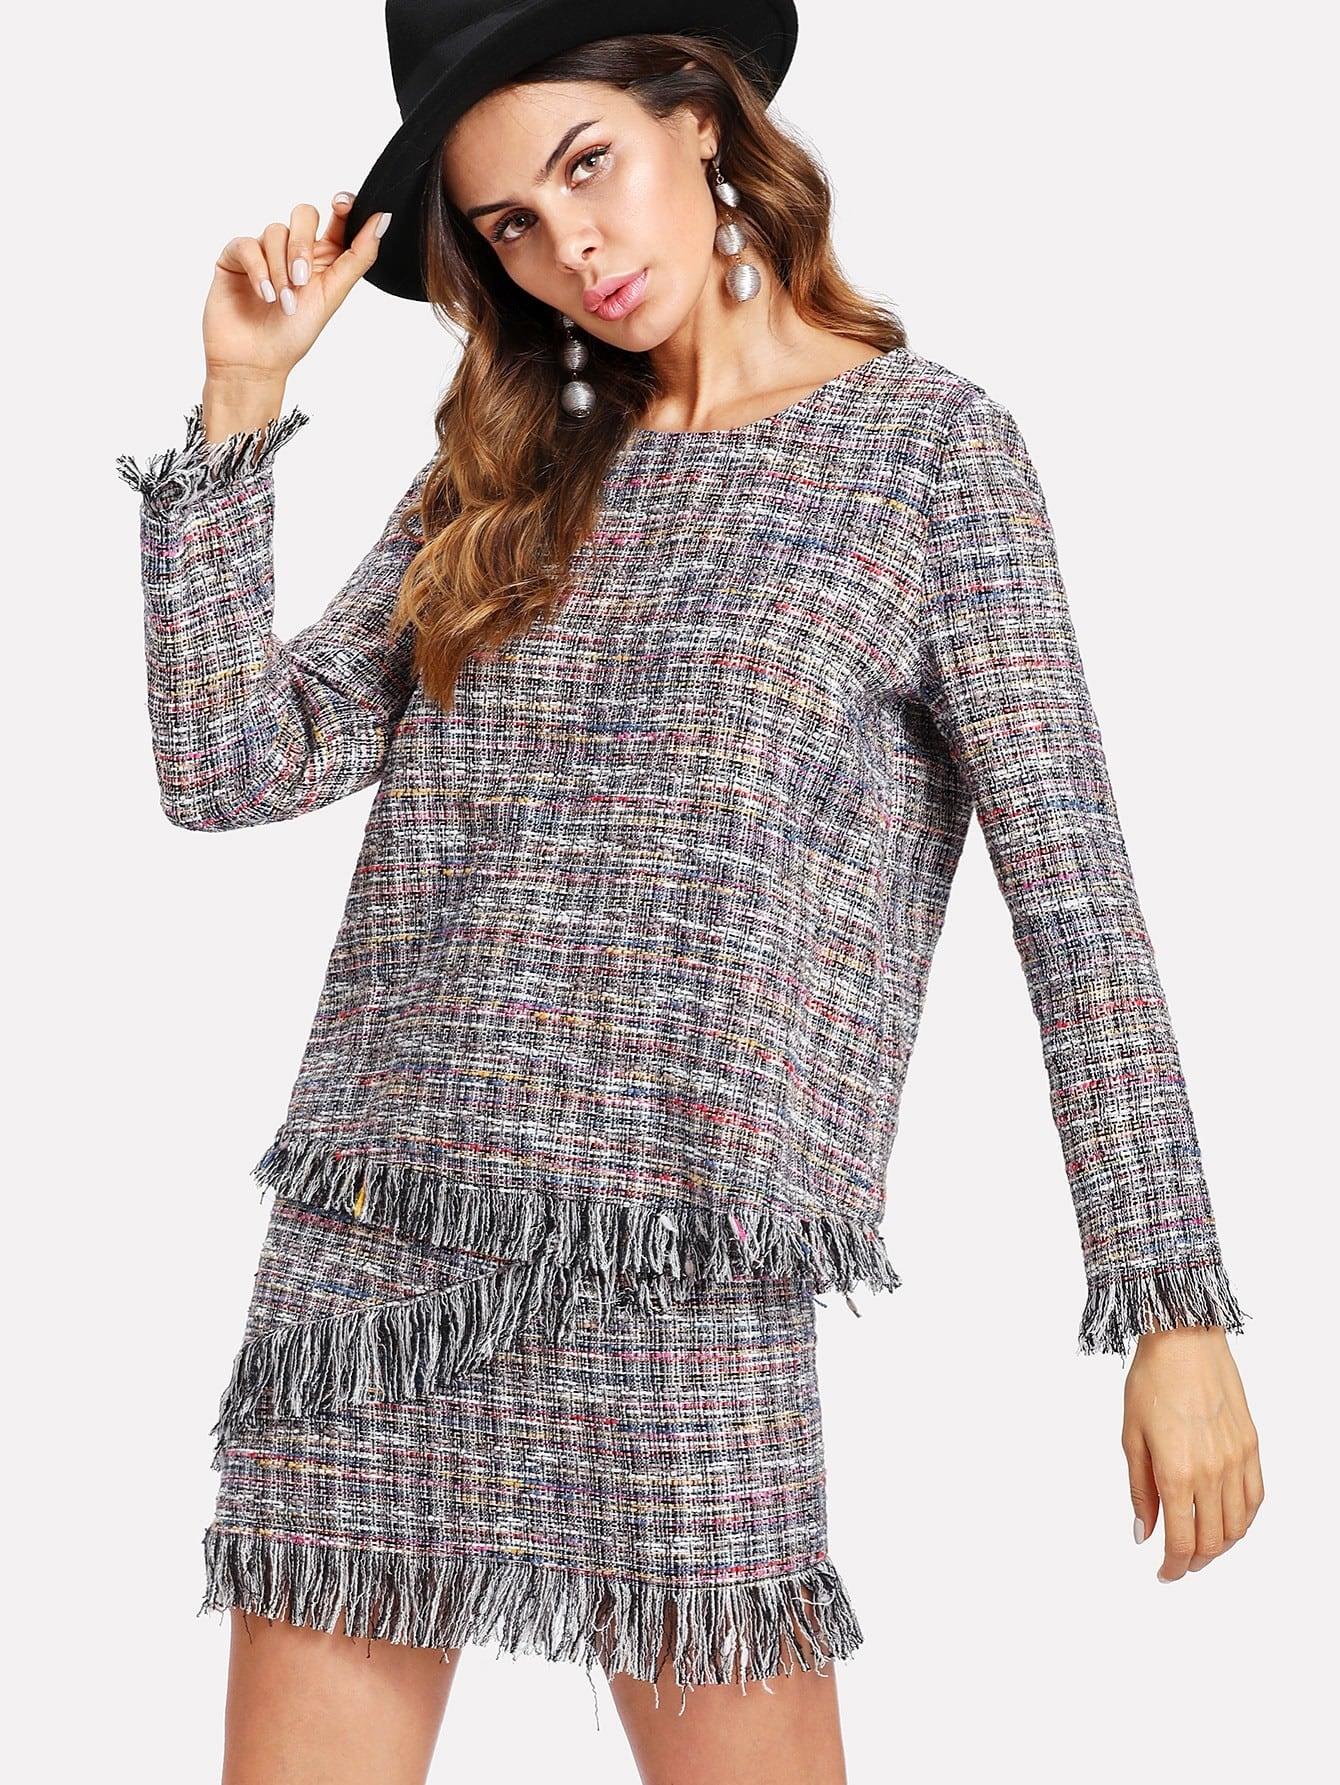 Fringe Trim Tweed Top & Skirt Set